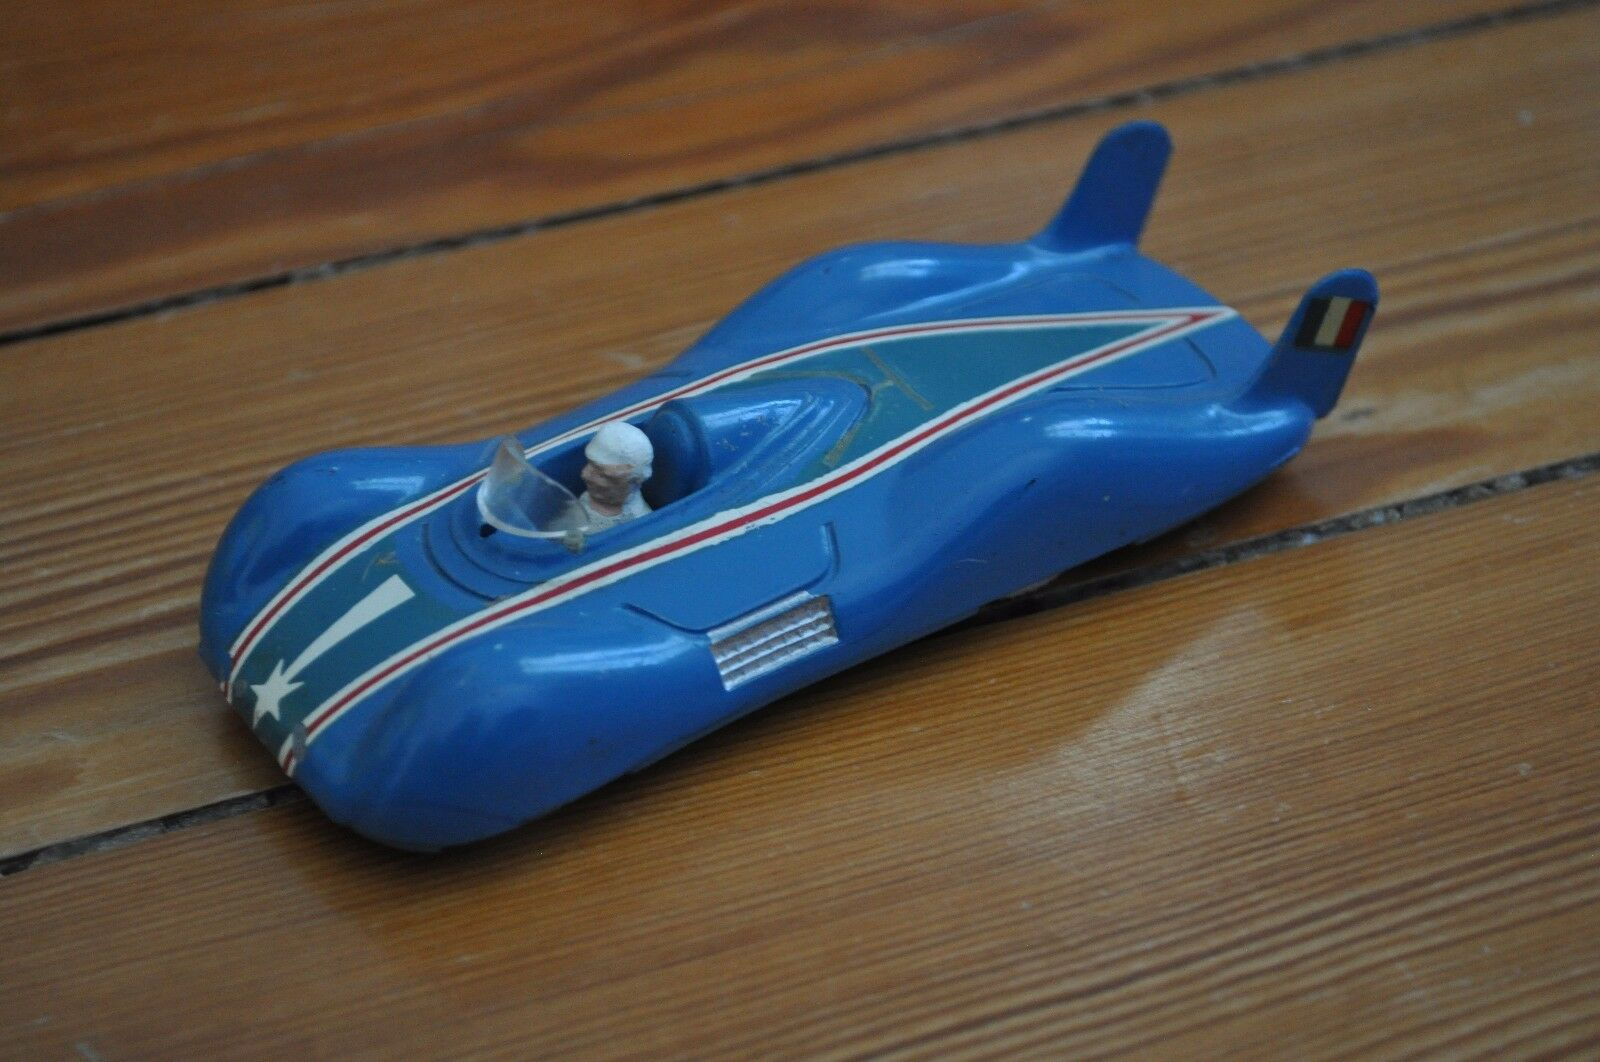 QUIRALU RENAULT ETOILE FILANTE  Miniature Die Cast - No Dinky Toys